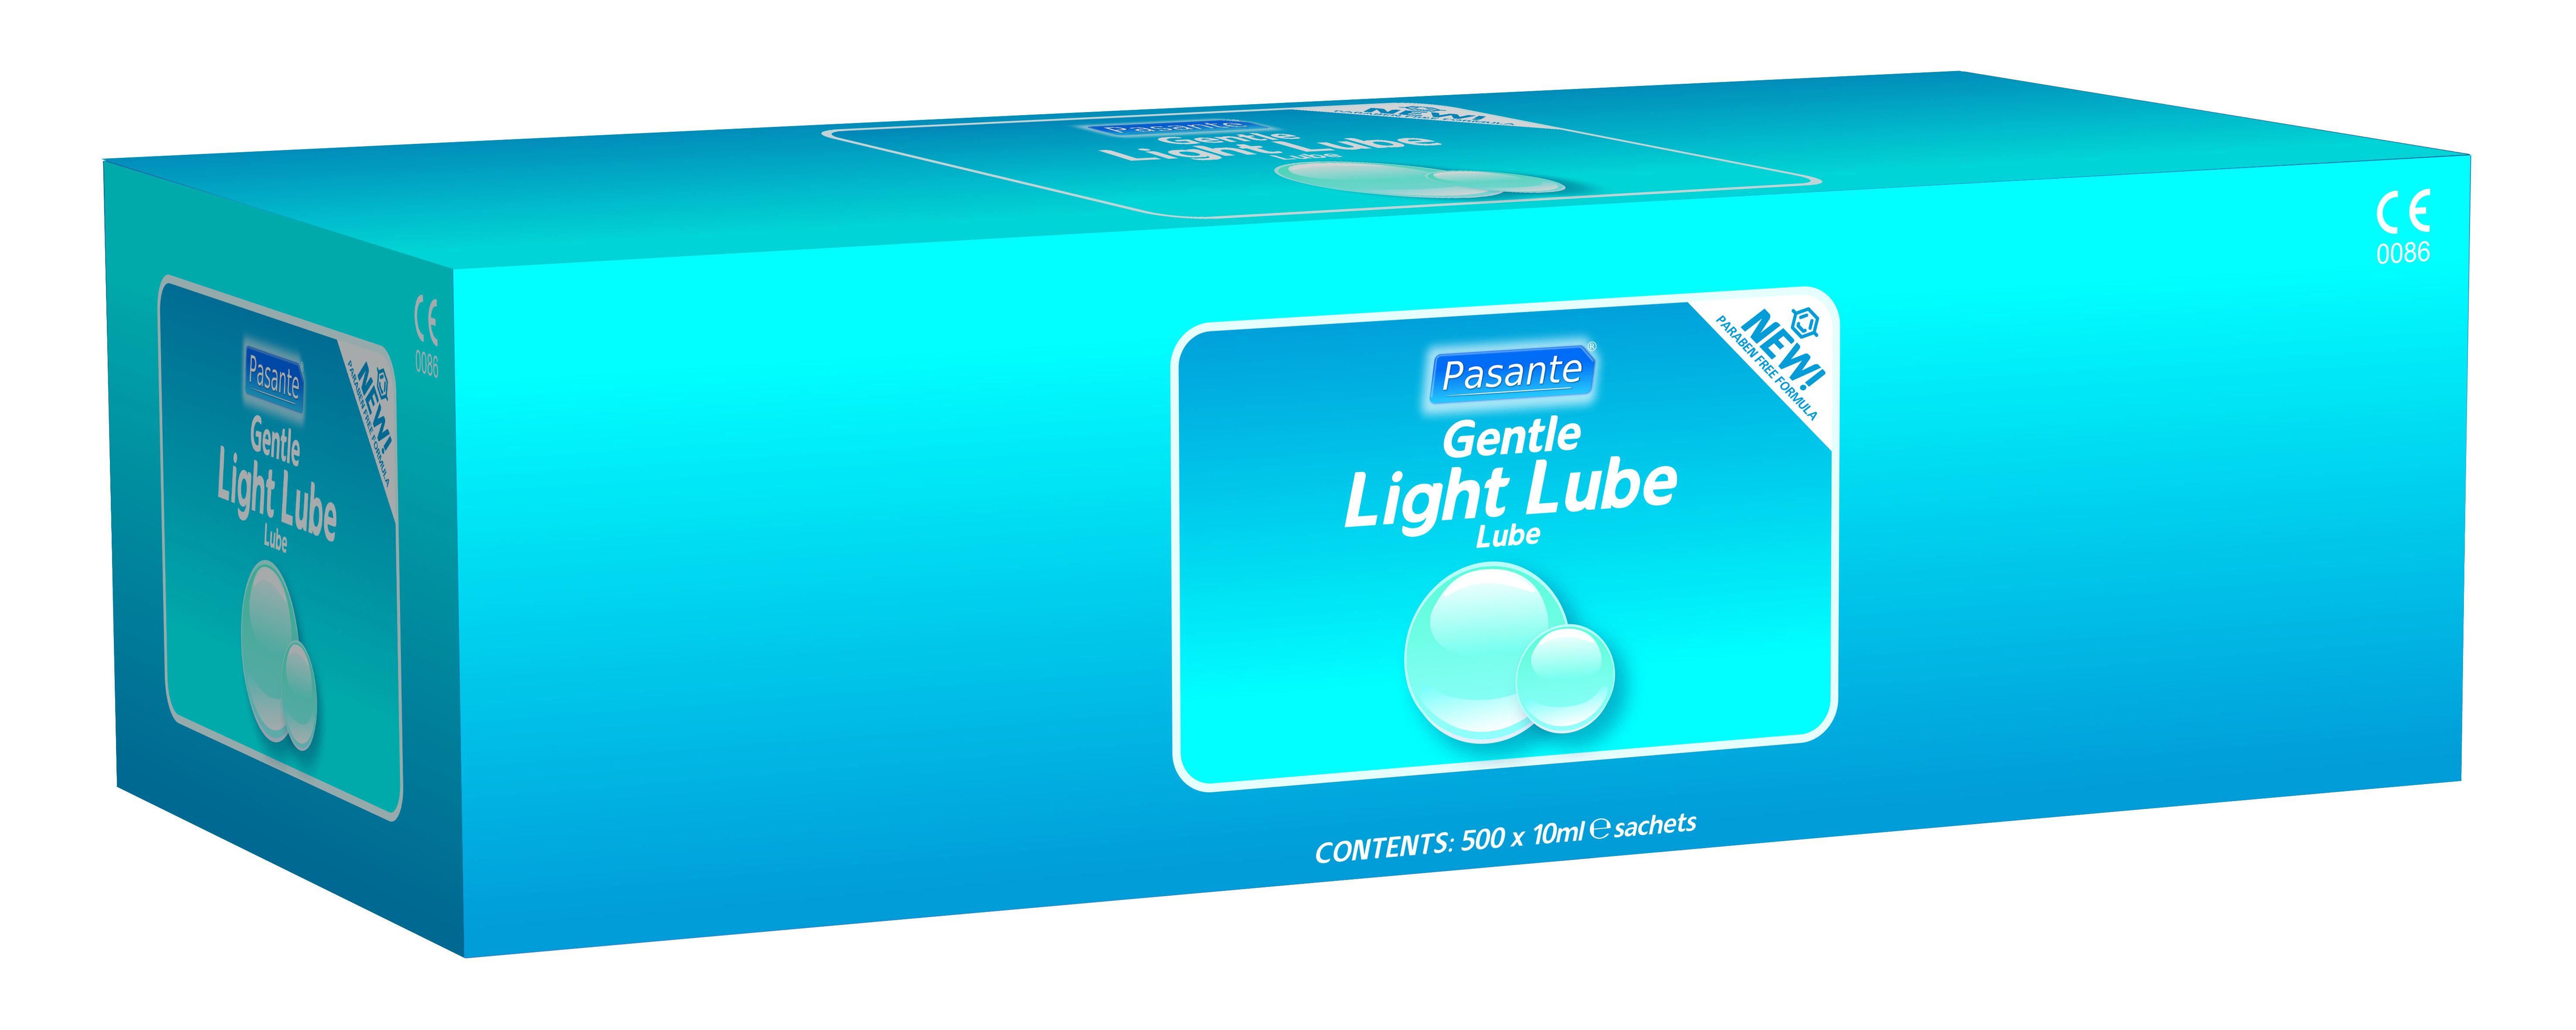 Pasante light lube 10ml sachets X 500 - paraben free